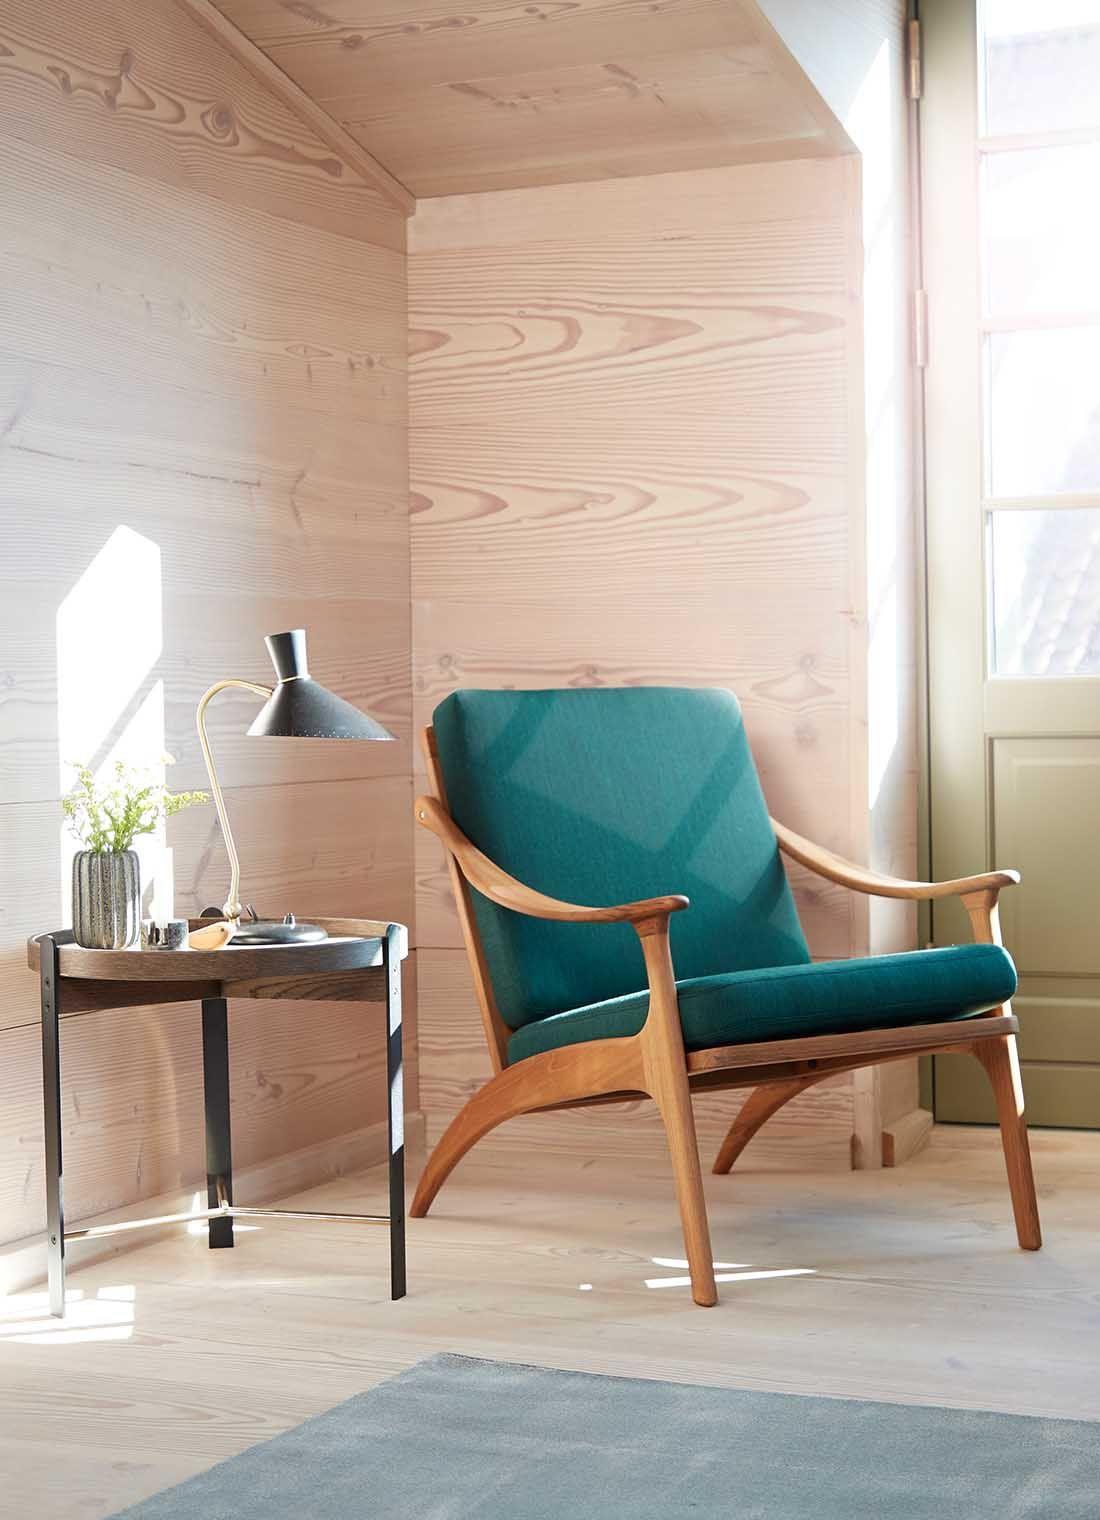 Fotel Mammoth   Designzoo   Stol design, Møbeldesign, Lounge